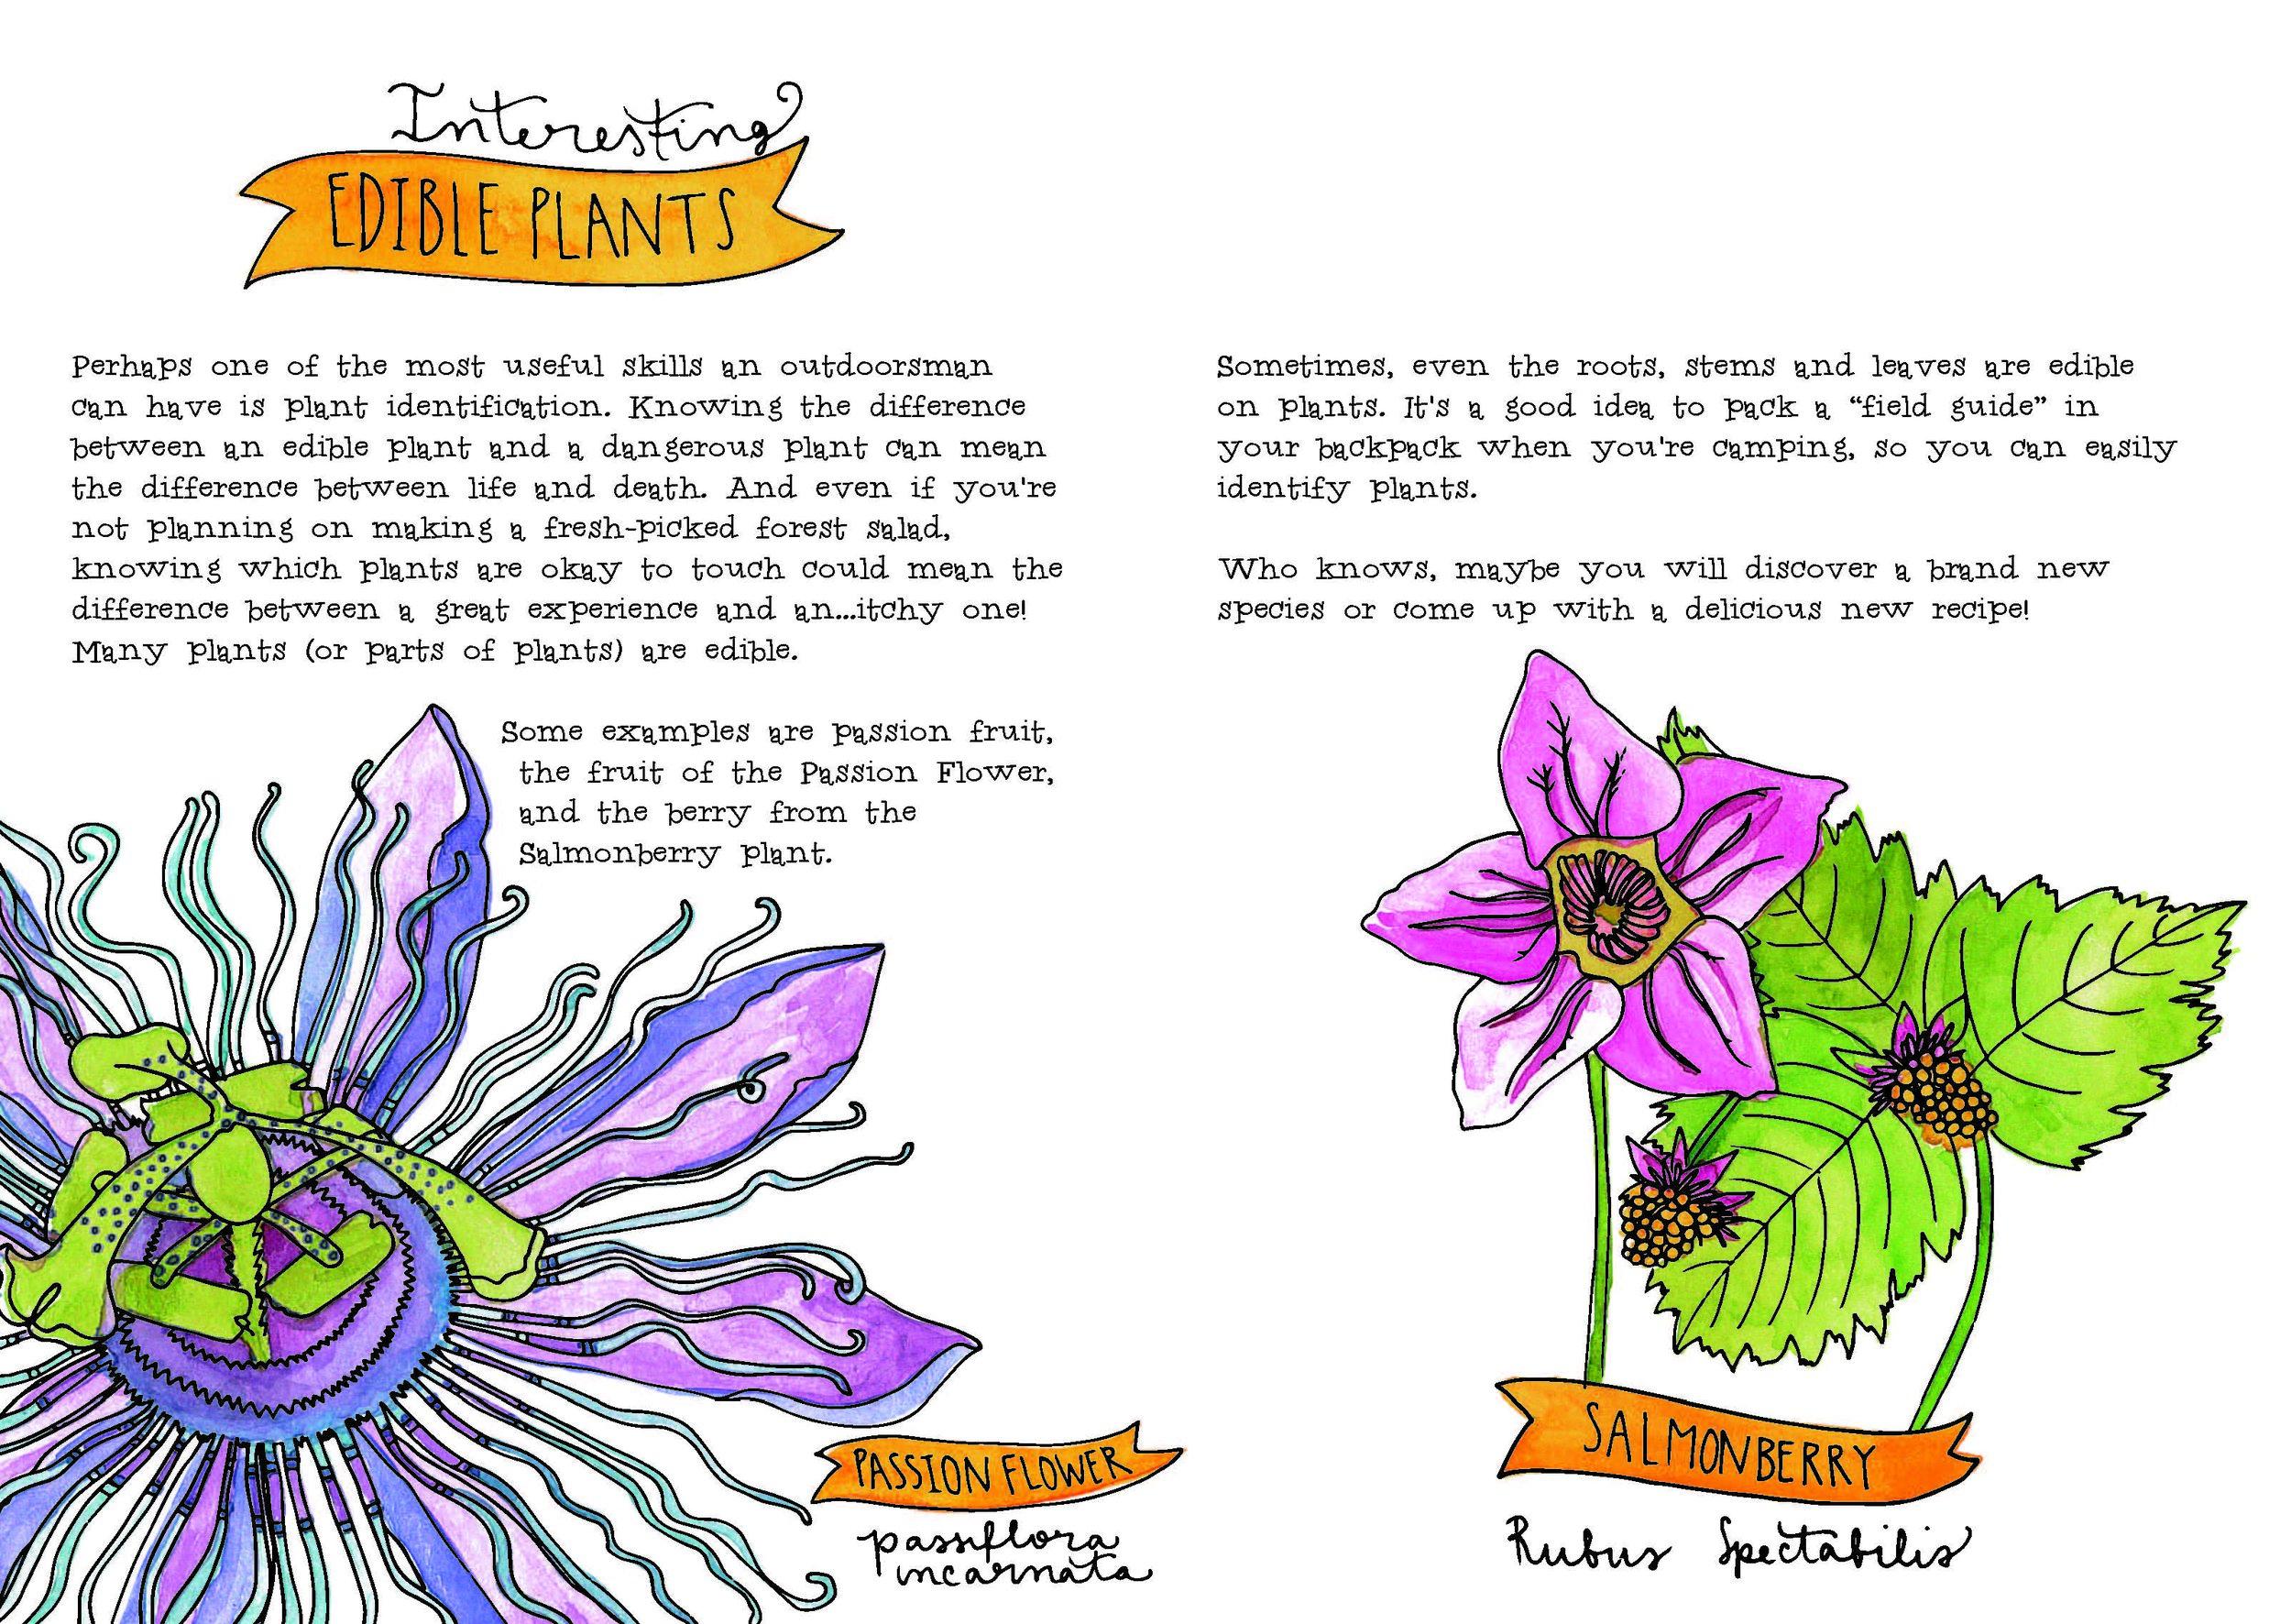 edible plants.jpg